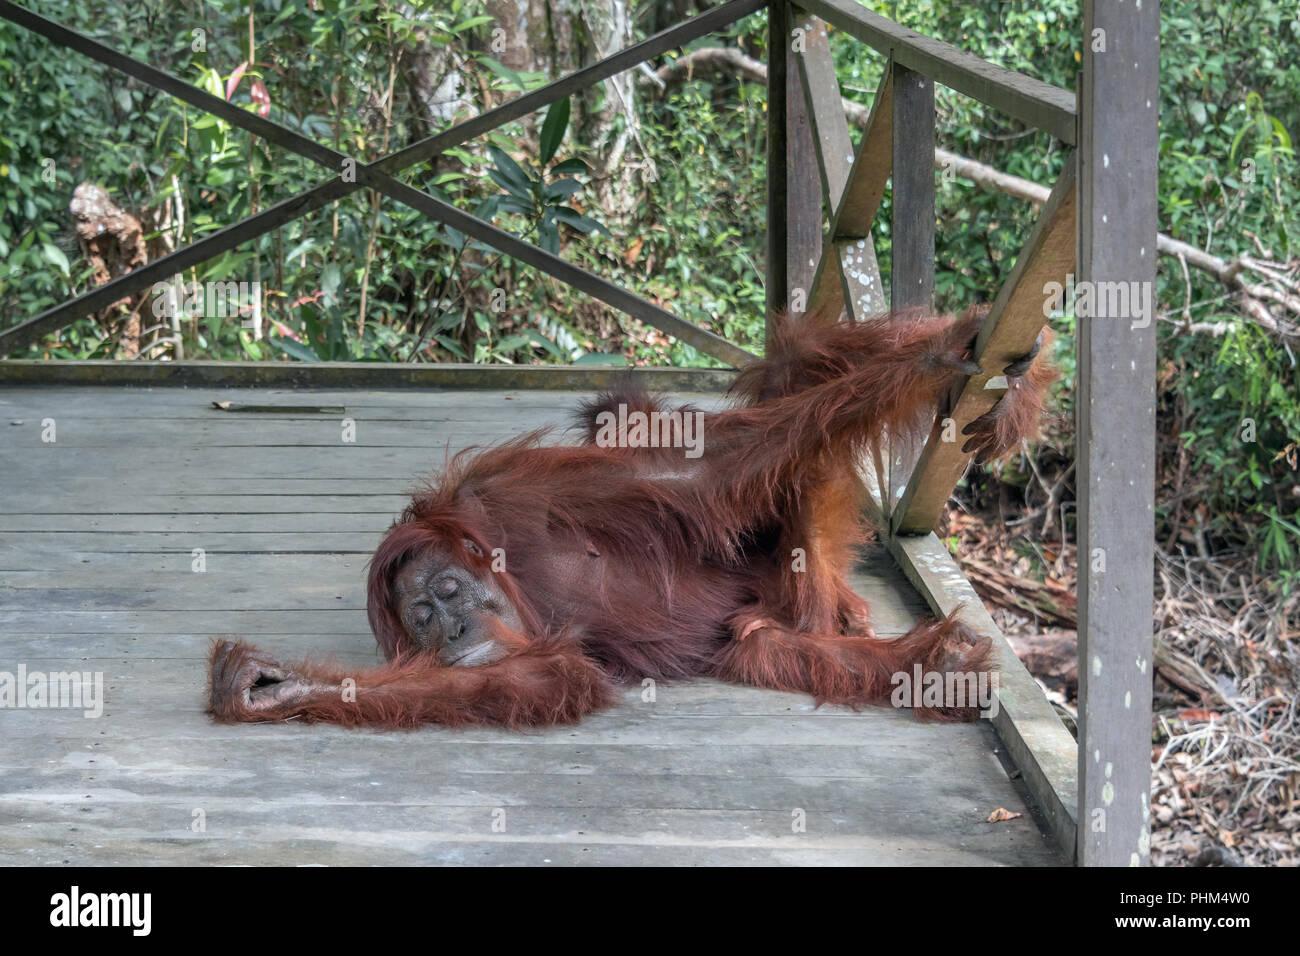 Wild Bornean oranutan finds a good place to take a nap, Tanjun Puting National Park, Kalimantan, Indonesia - Stock Image